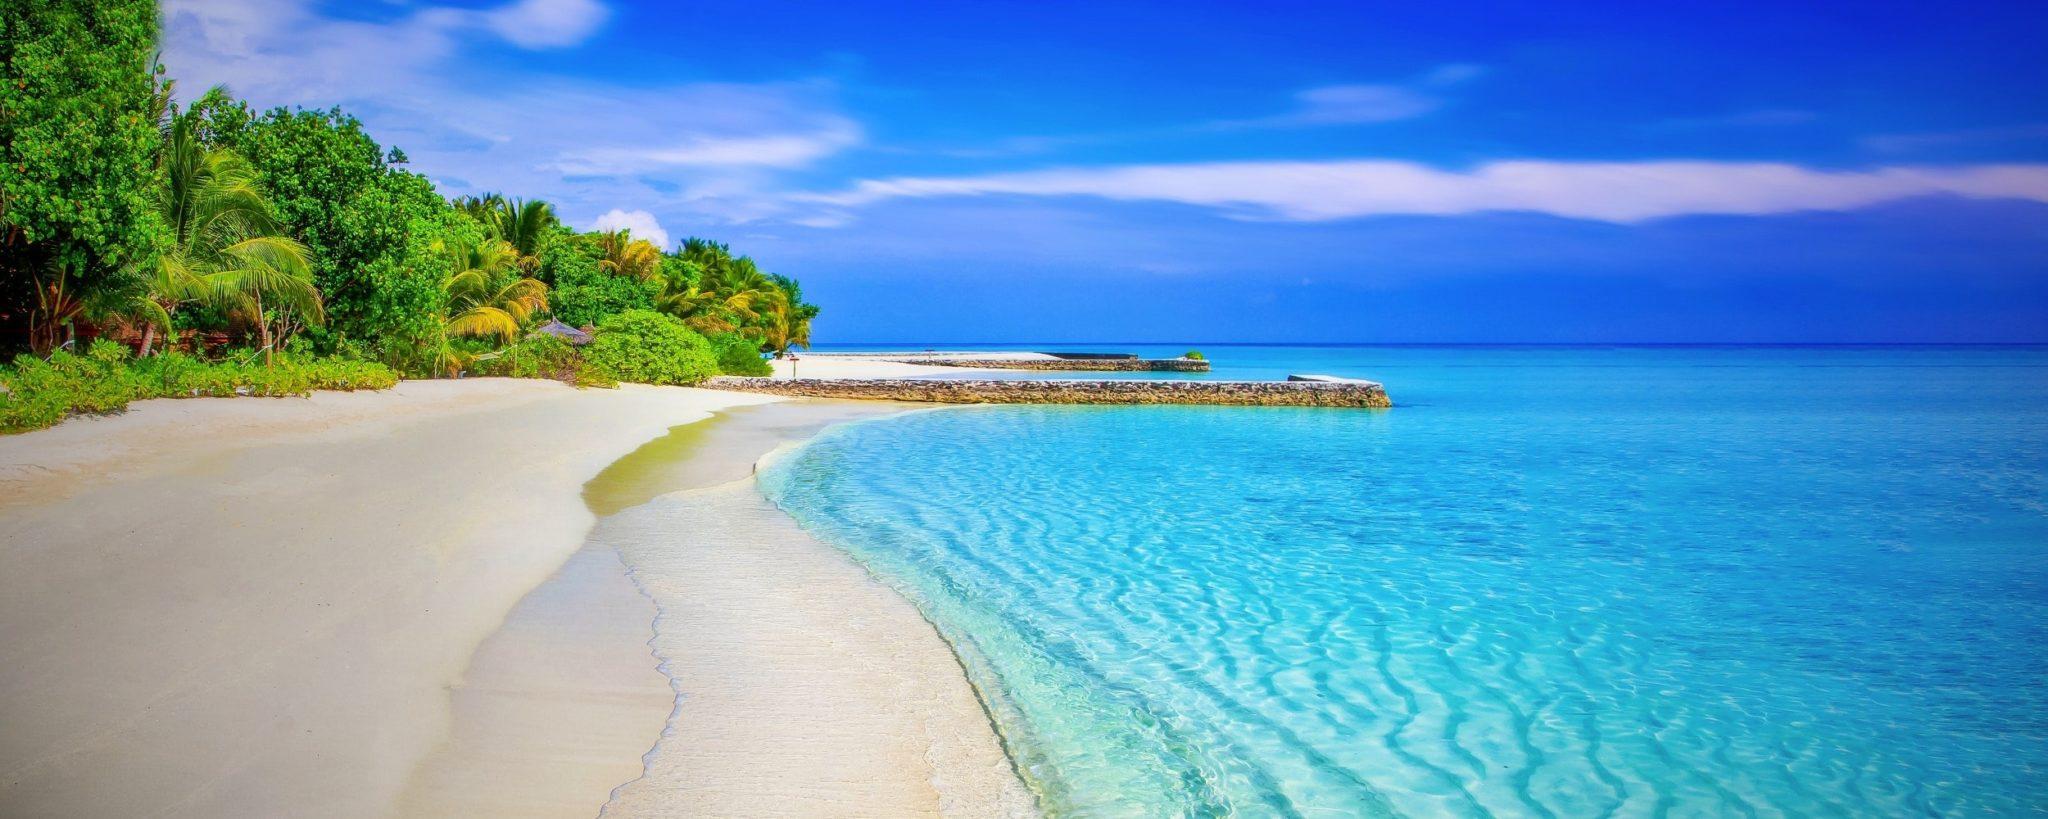 flights to Australia - Top layover destinations Mauritius